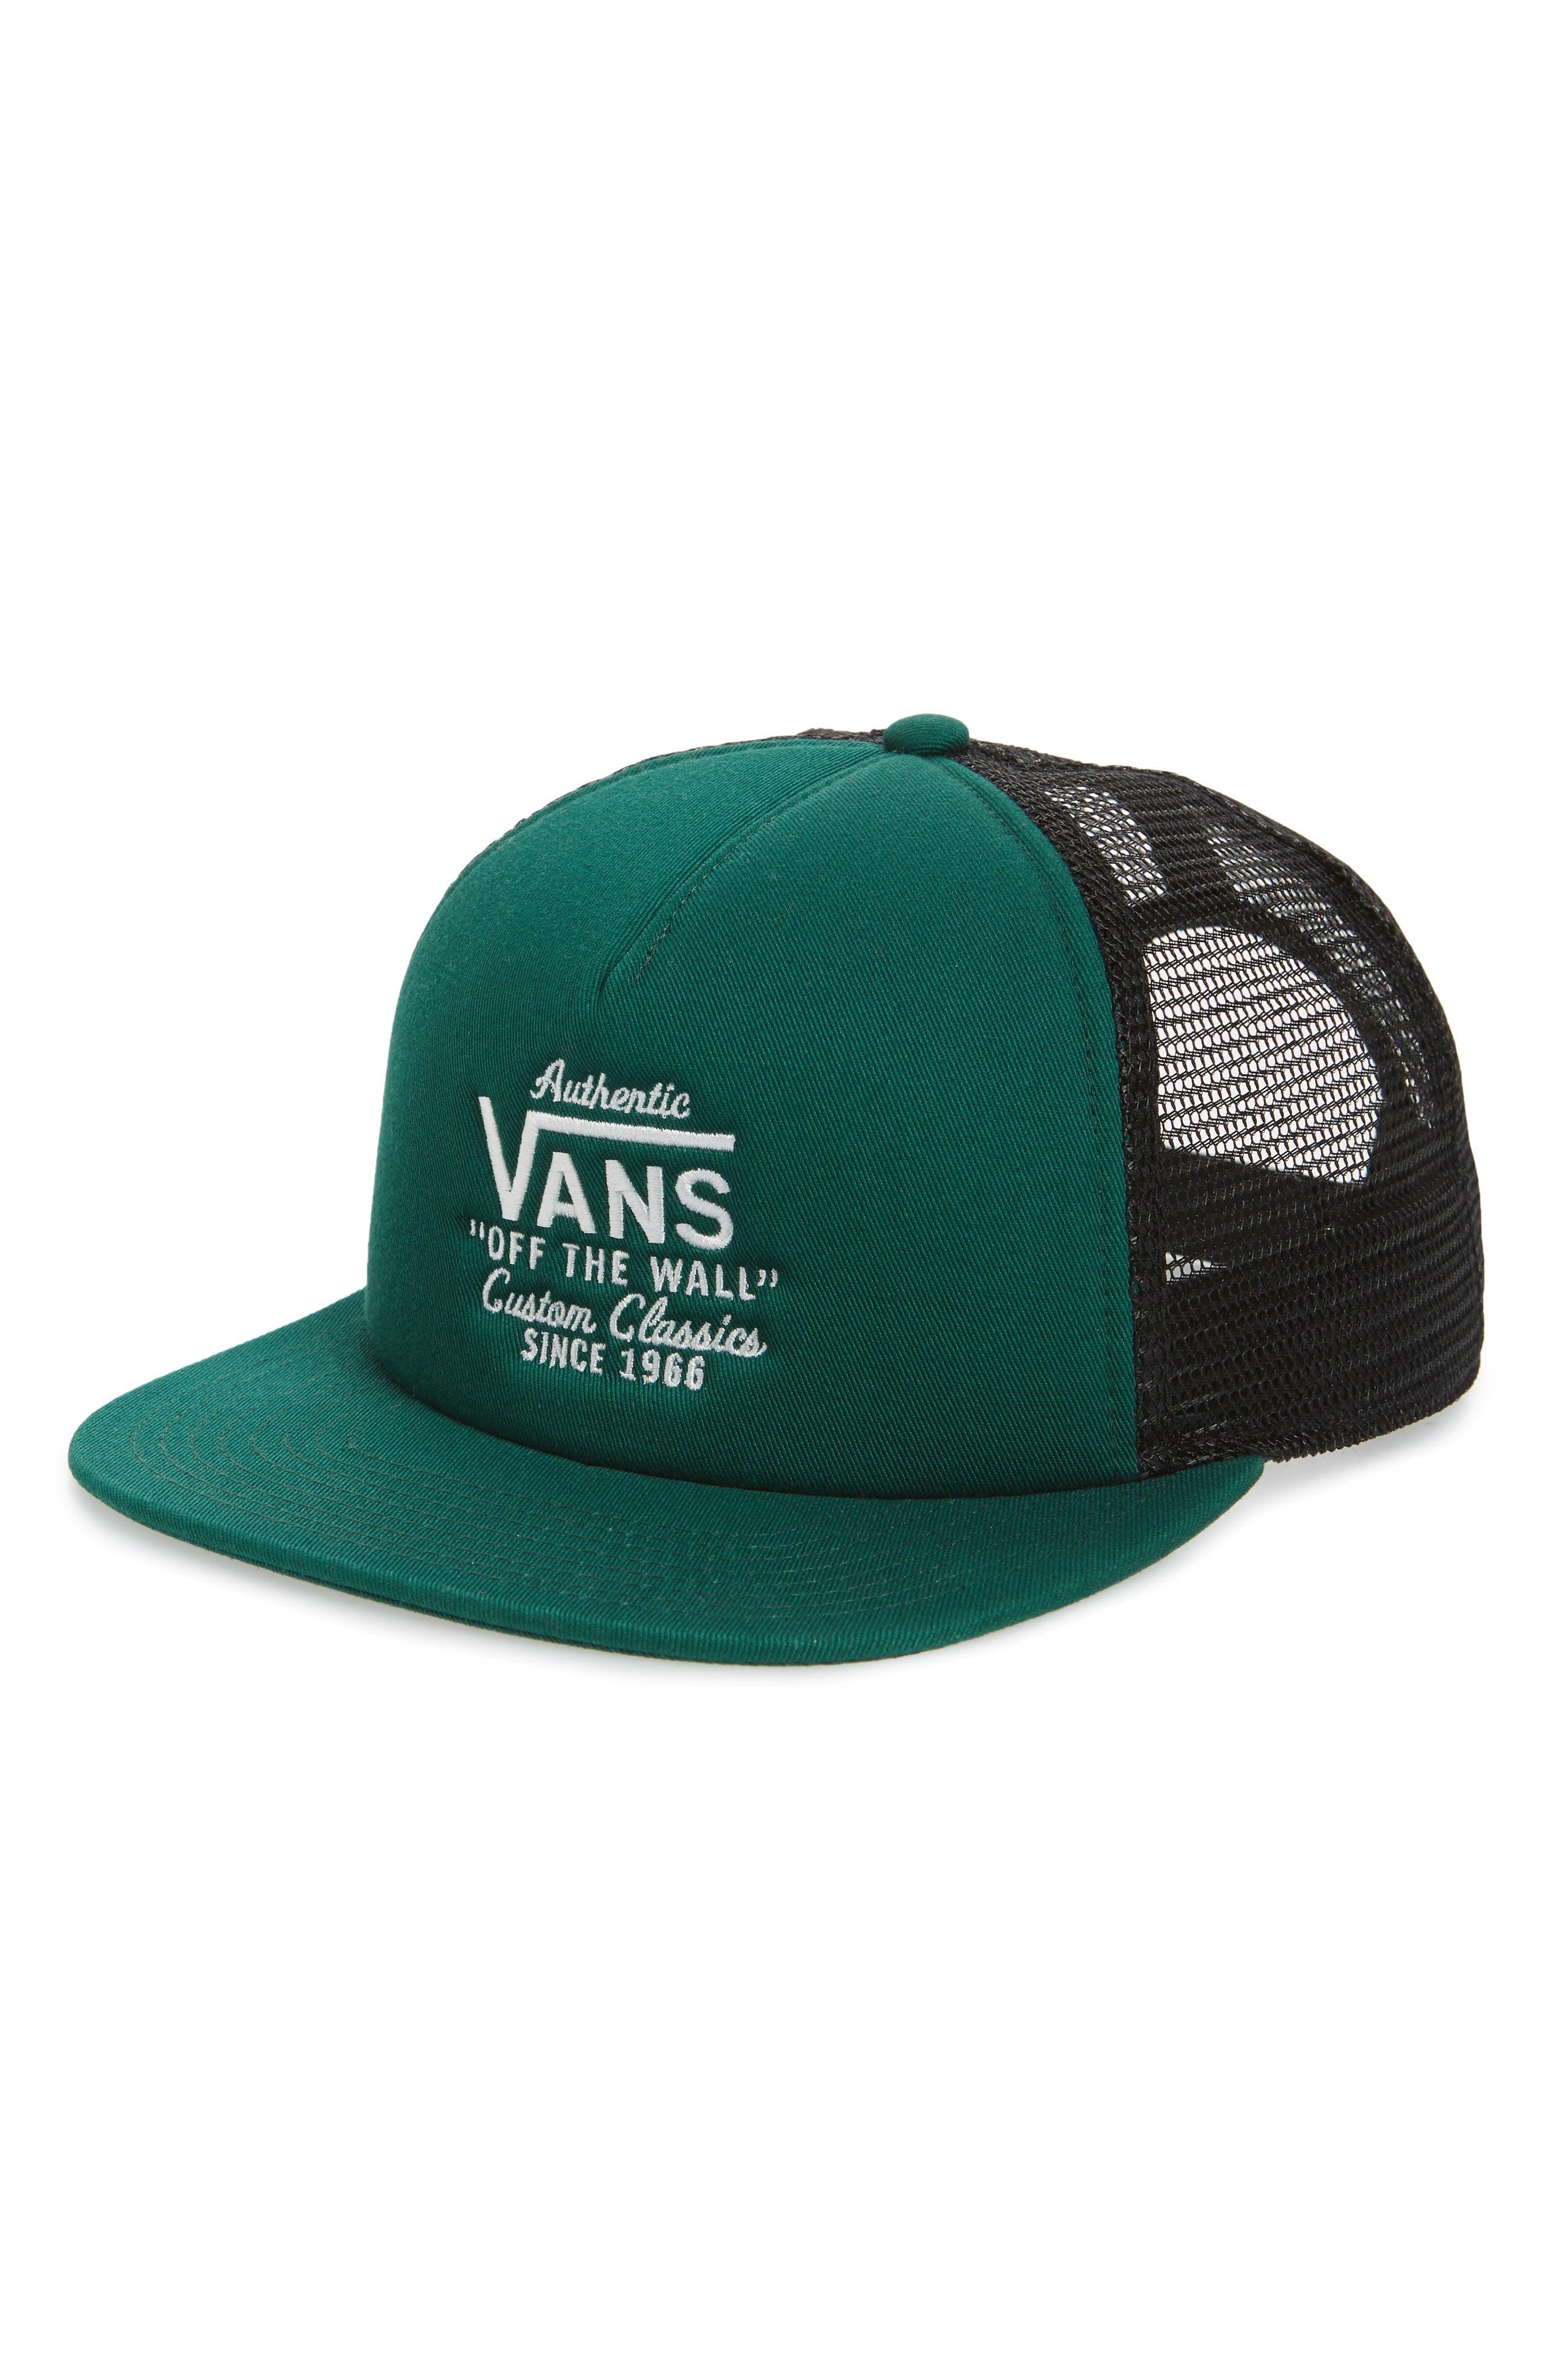 VANS Galer Embroidered Trucker Hat, Main, color, EVERGREEN